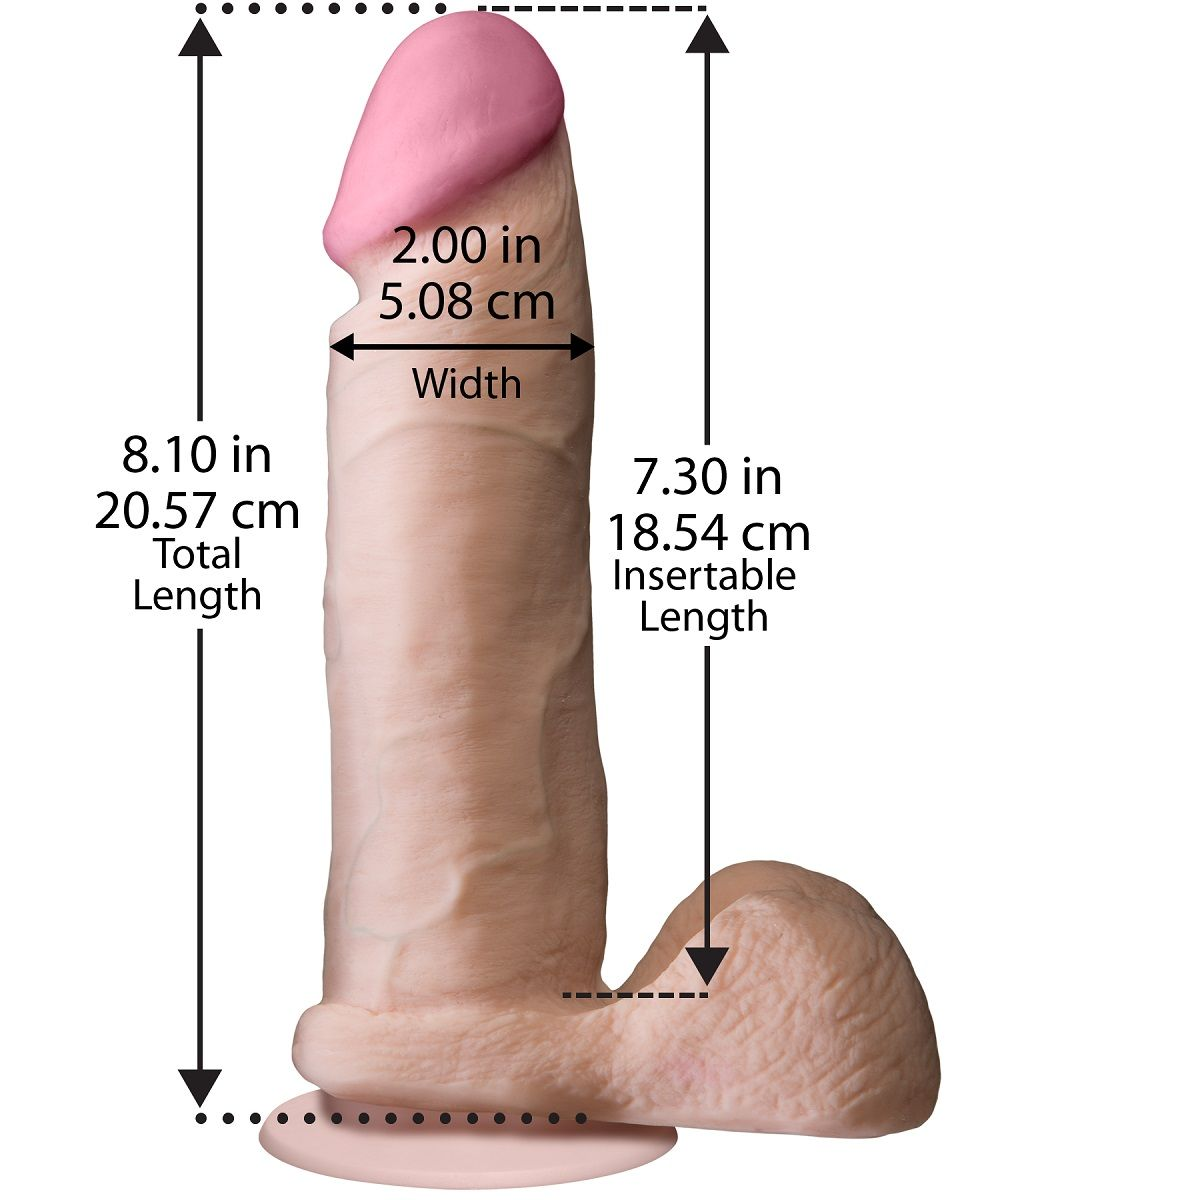 "Ультрареалистичный фаллоимитатор The Realistic Cock ULTRASKYN 8"" - 20,57 см. - фото 128468"